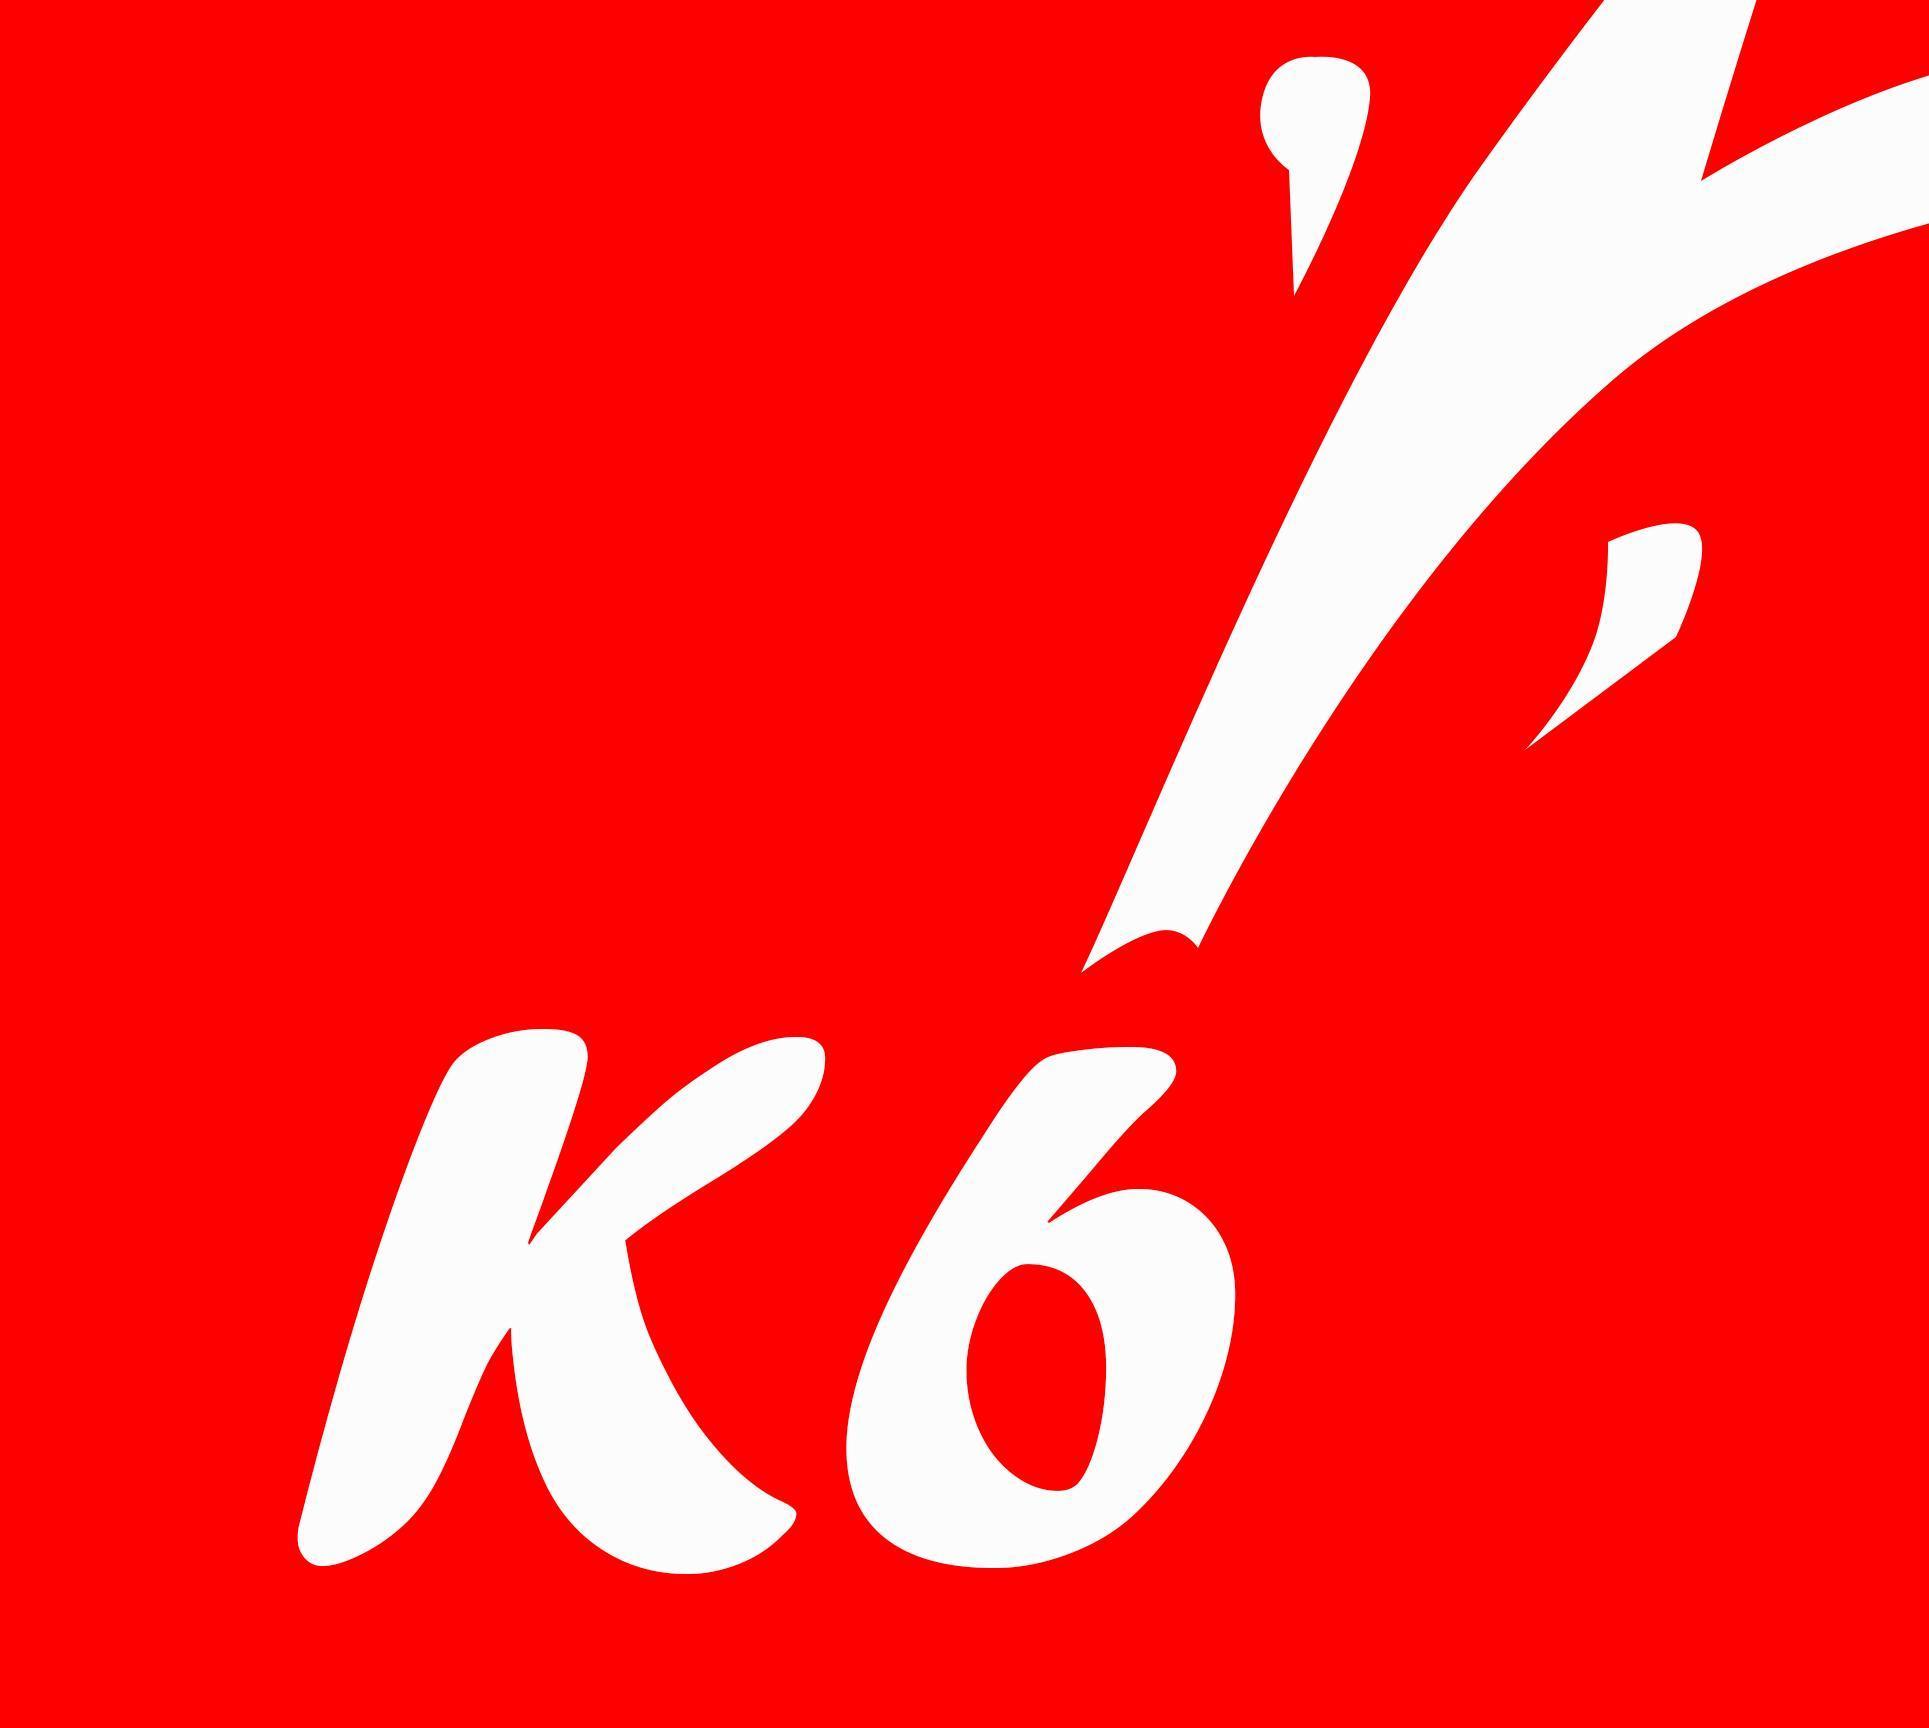 Kamelo6?s=i2qplgjeswzqy45gxql6tbgicyesm2fbh8qwehc4io8=